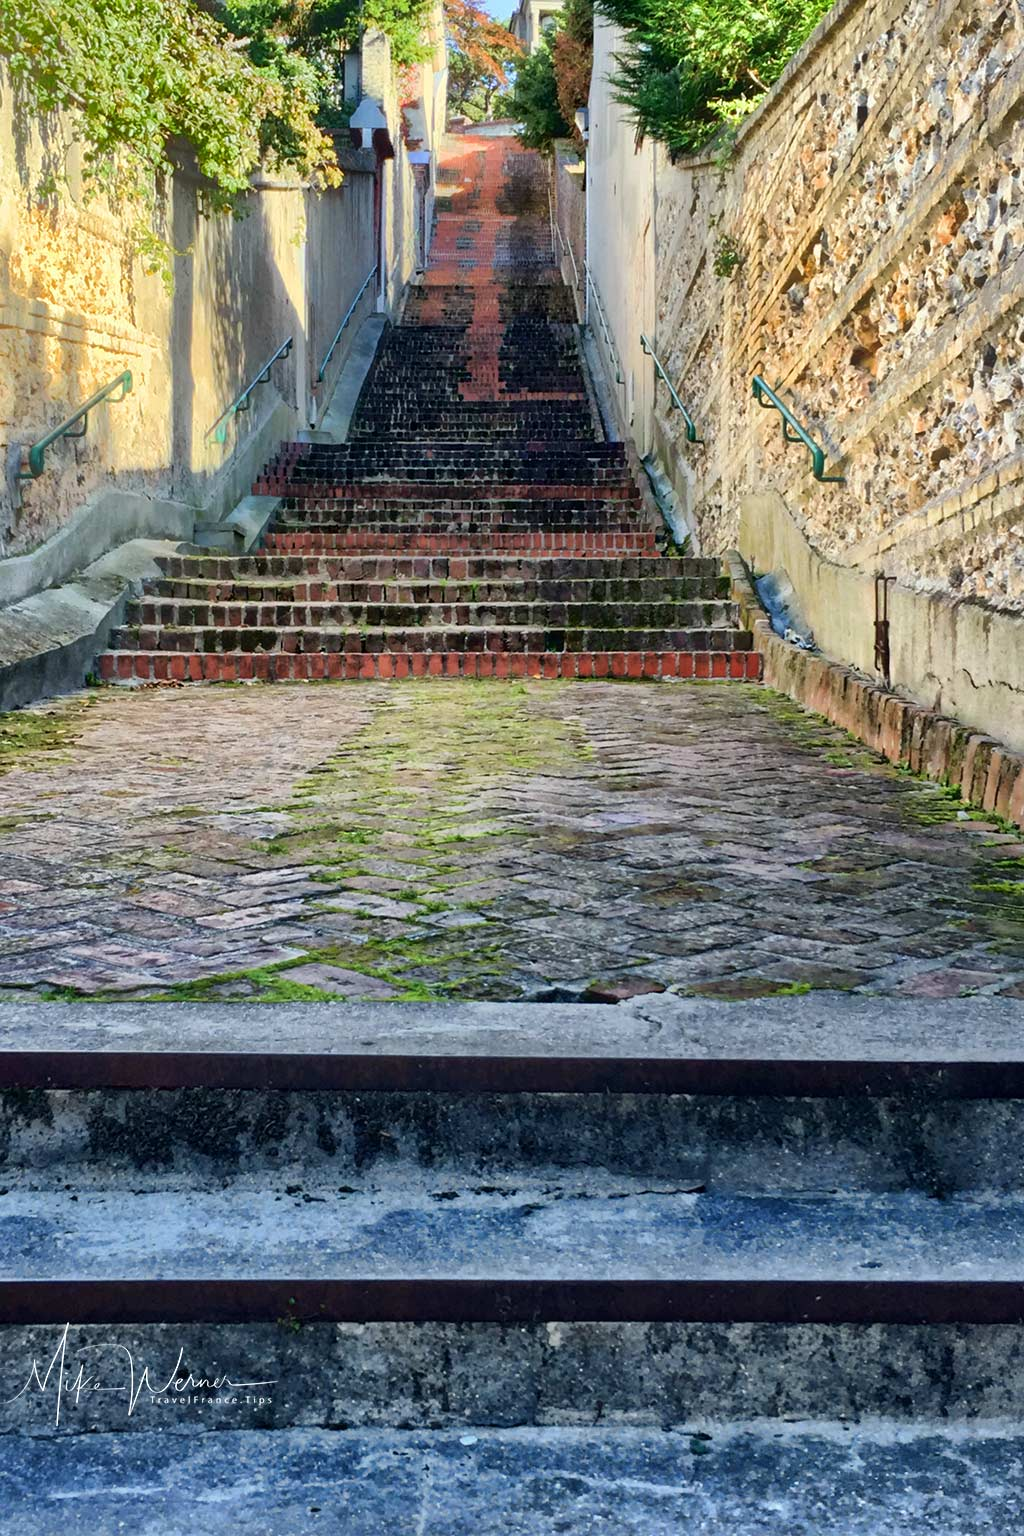 The stairs named Escalier de-la-Cote-Morisse in Le Havre, Normandy